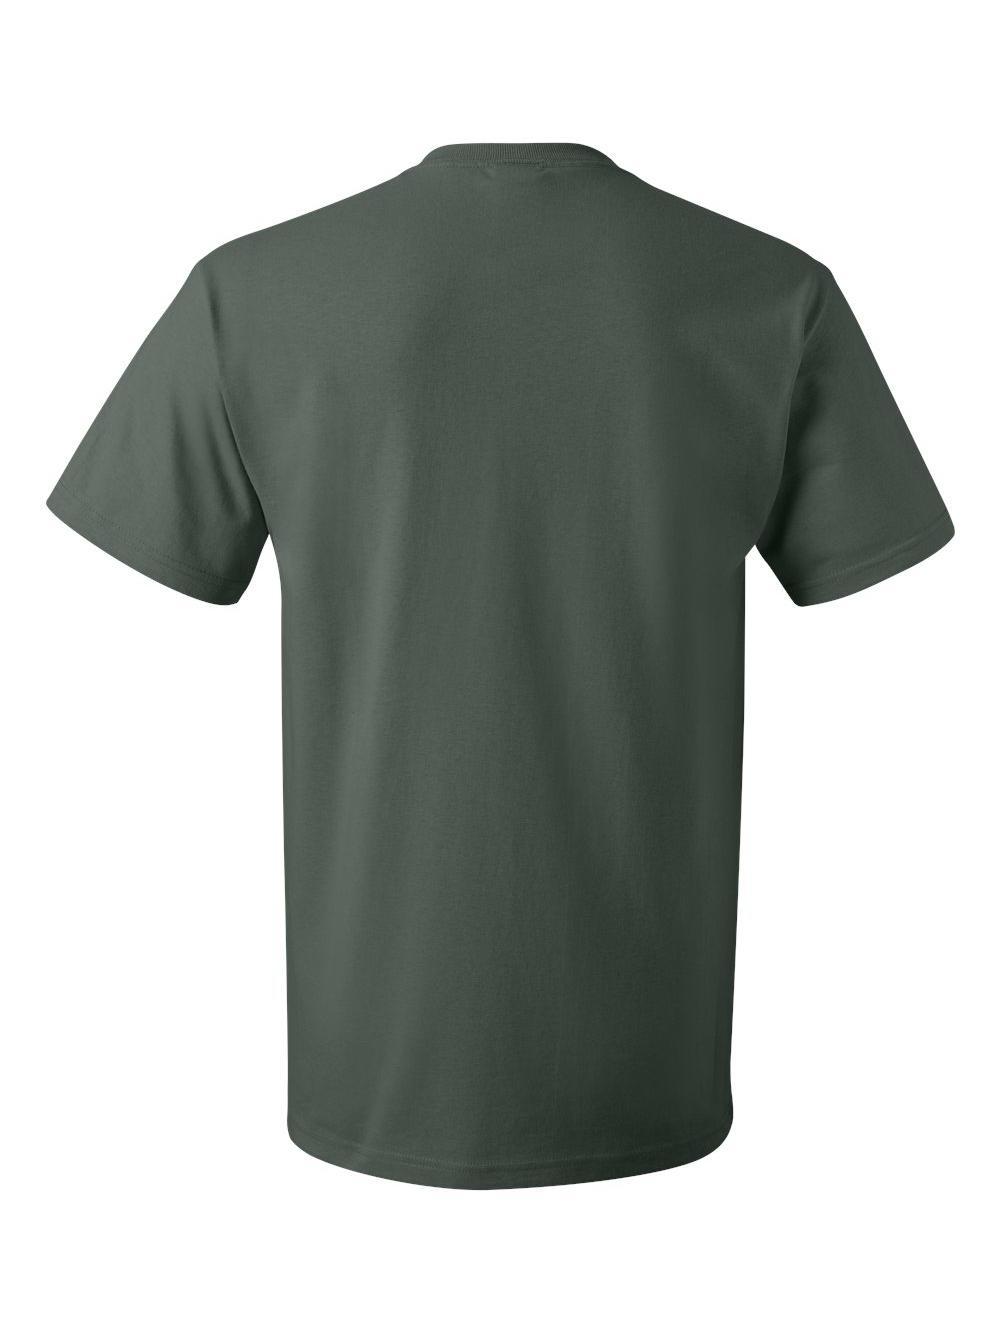 Fruit-of-the-Loom-HD-Cotton-Short-Sleeve-T-Shirt-3930R thumbnail 55